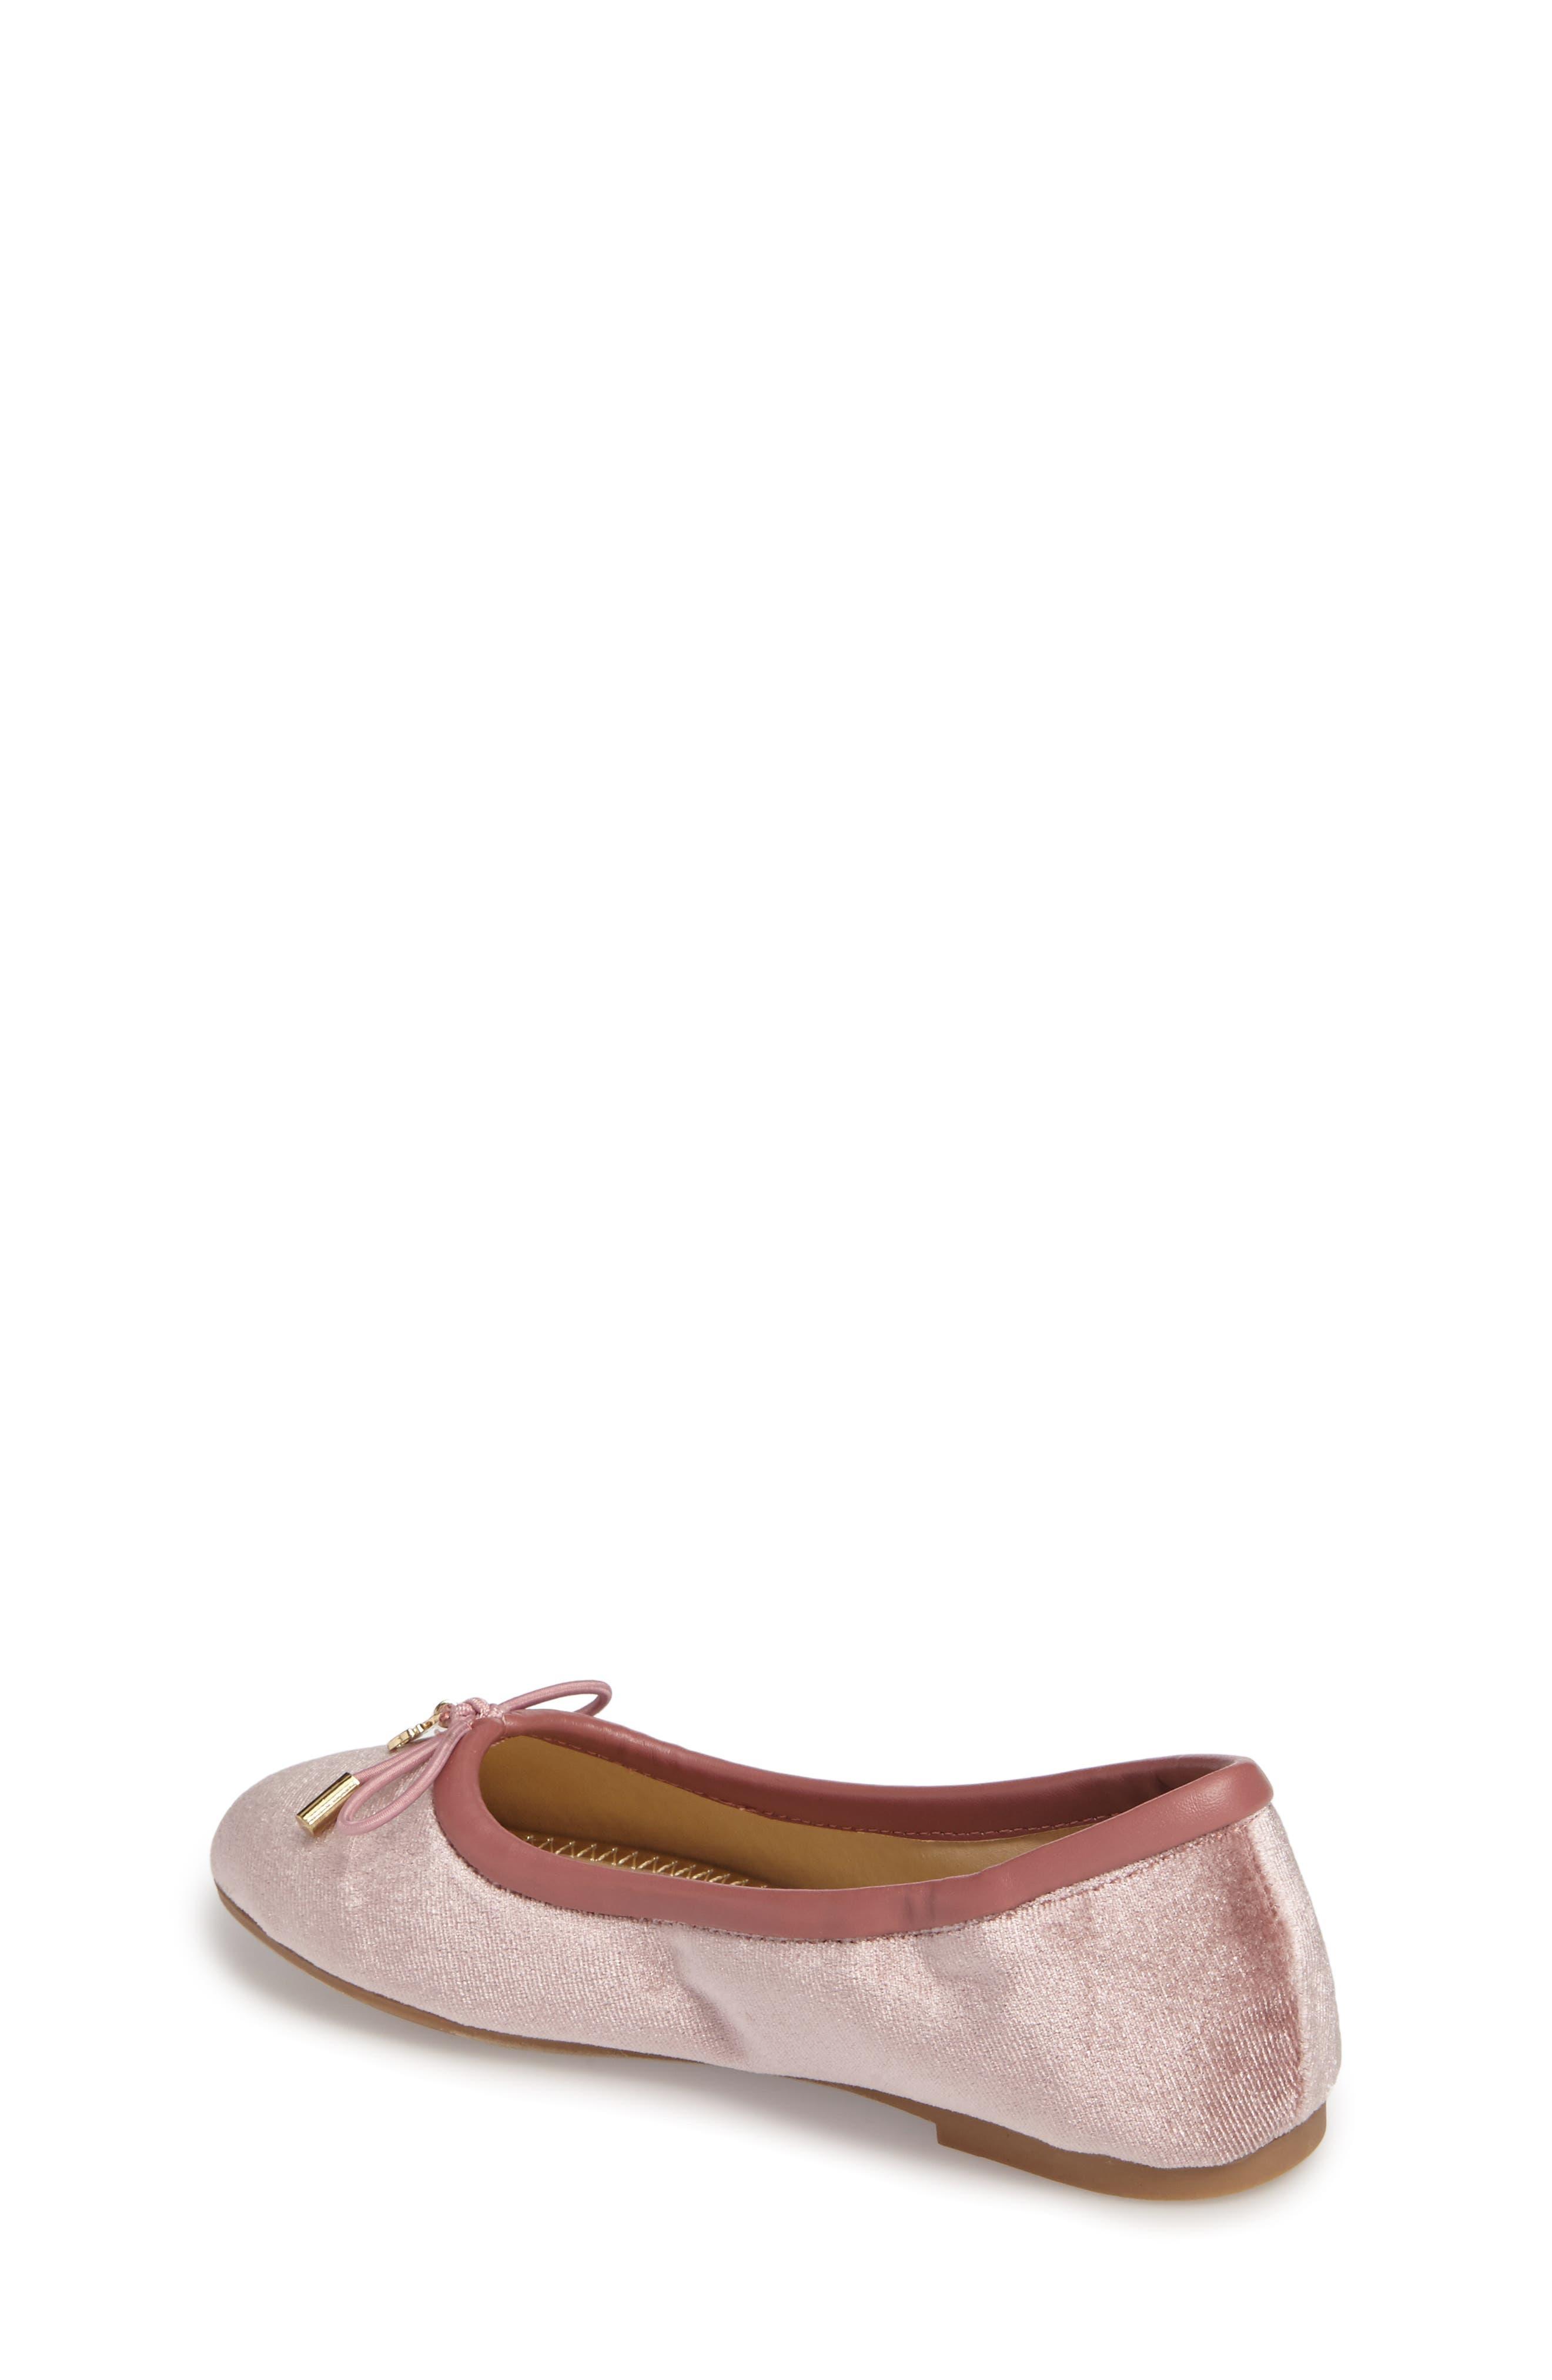 Alternate Image 2  - Sam Edelman 'Felicia' Ballet Flat (Toddler, Little Kid & Big Kid)